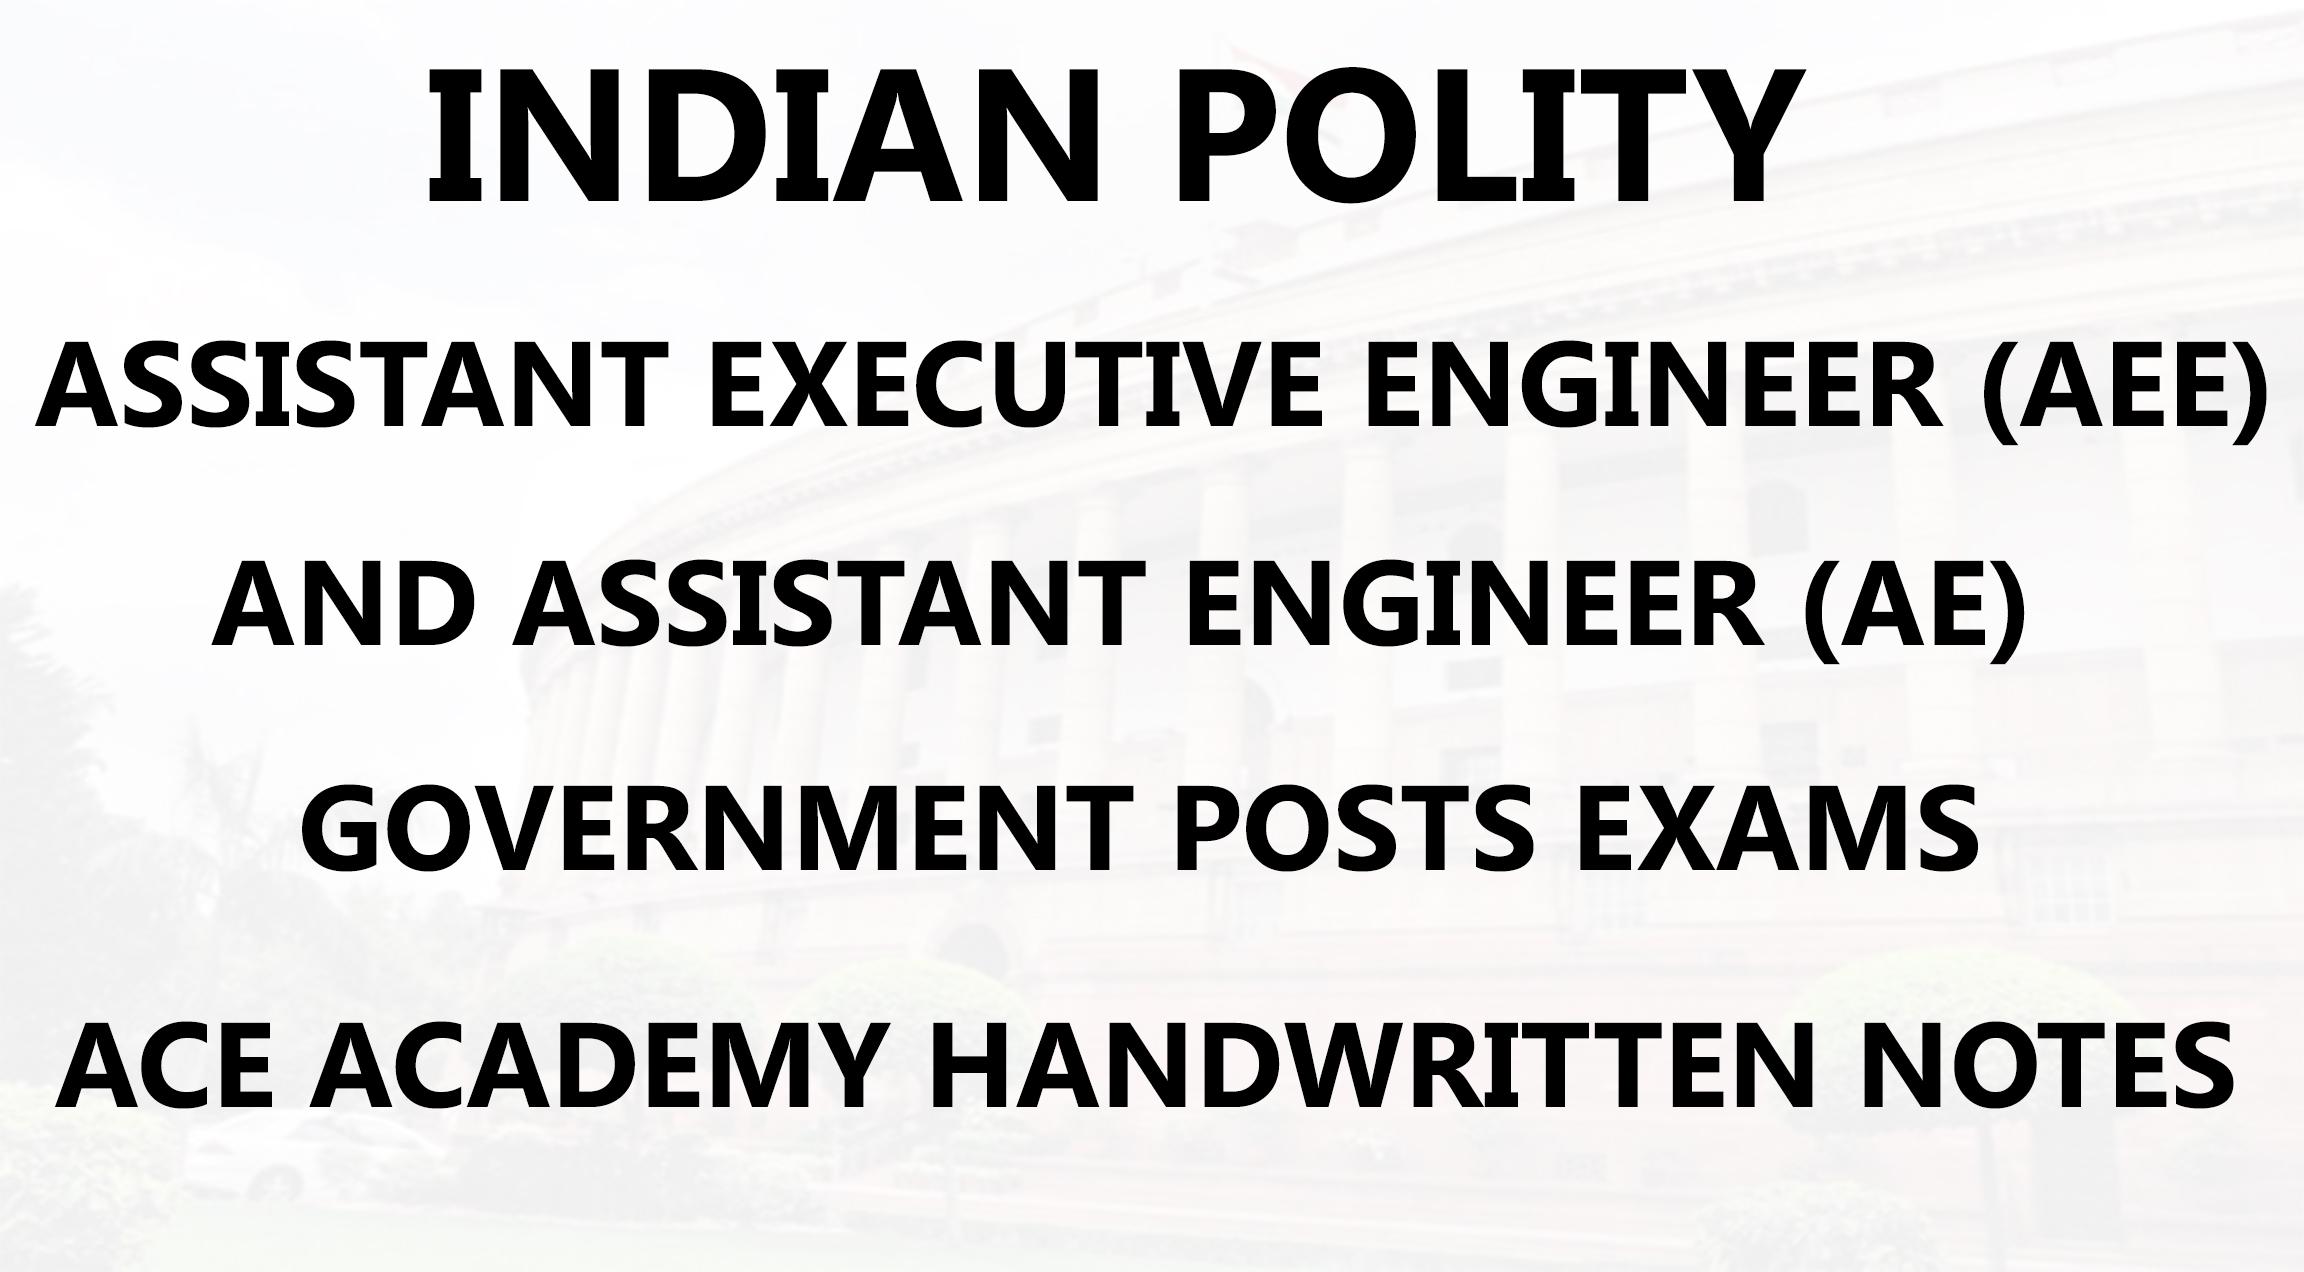 Indian Polity AE AEE Civil Engineering Handwritten Notes PDF